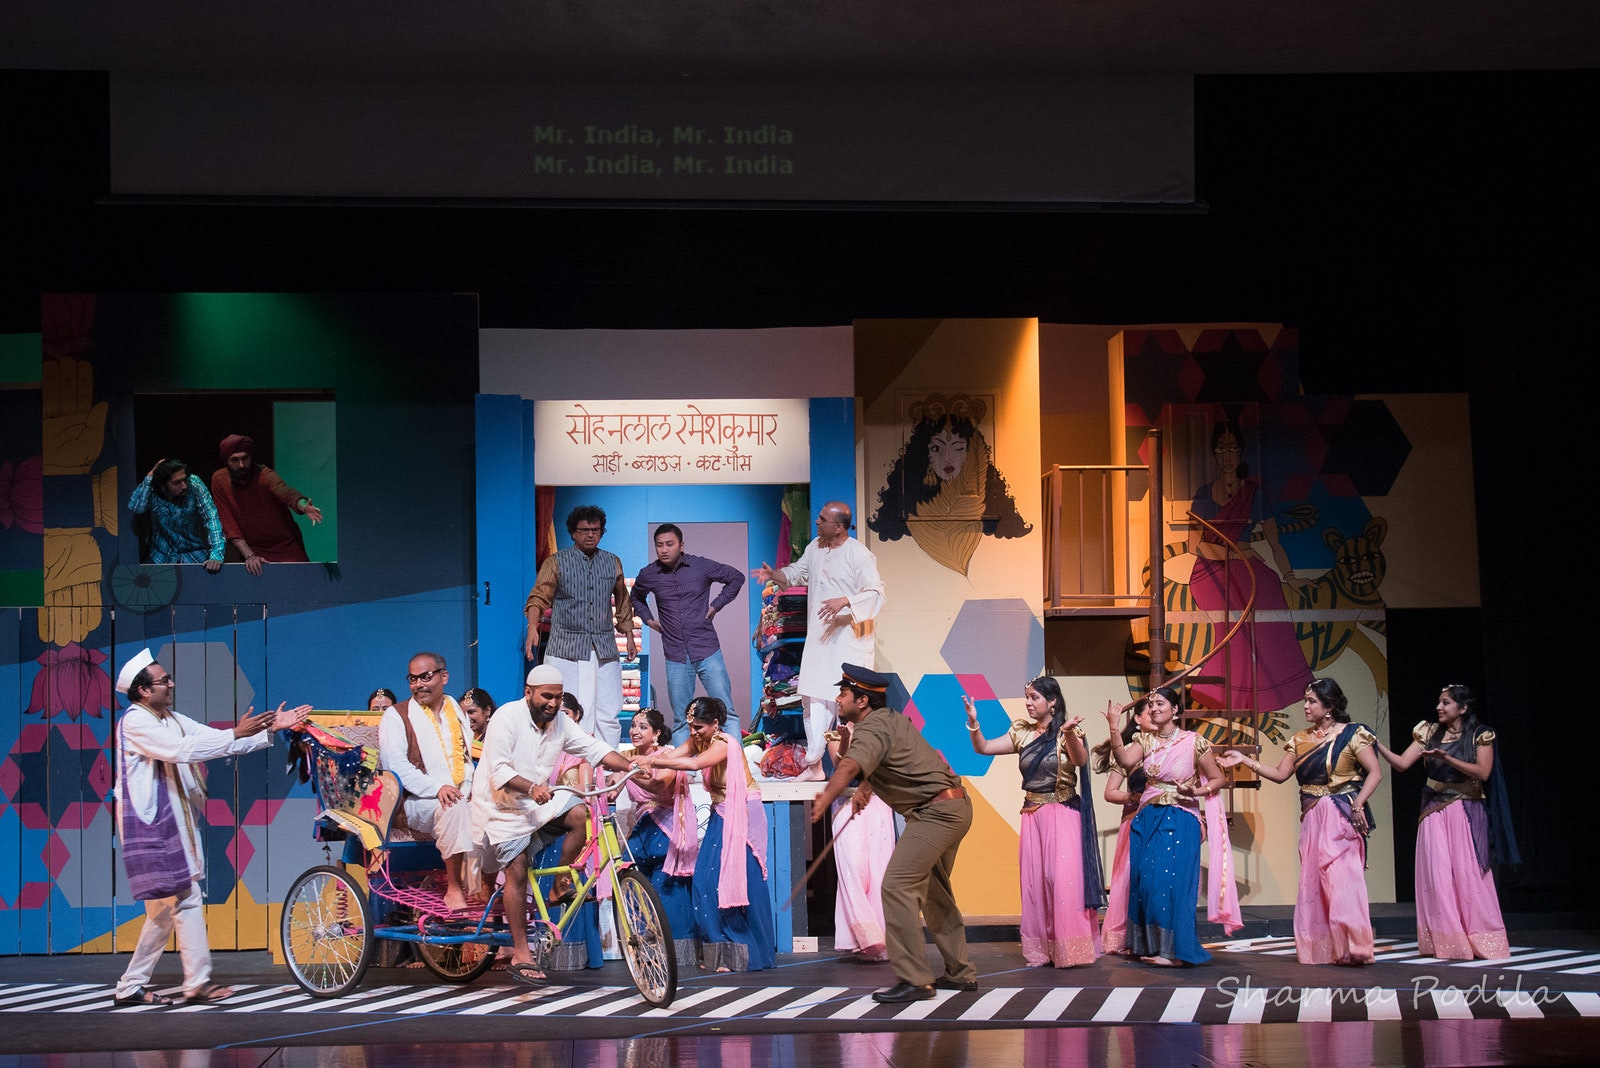 "<p><em>Naatak production of ""Mr. India."" Photo by Sharma Podila.</em></p>"